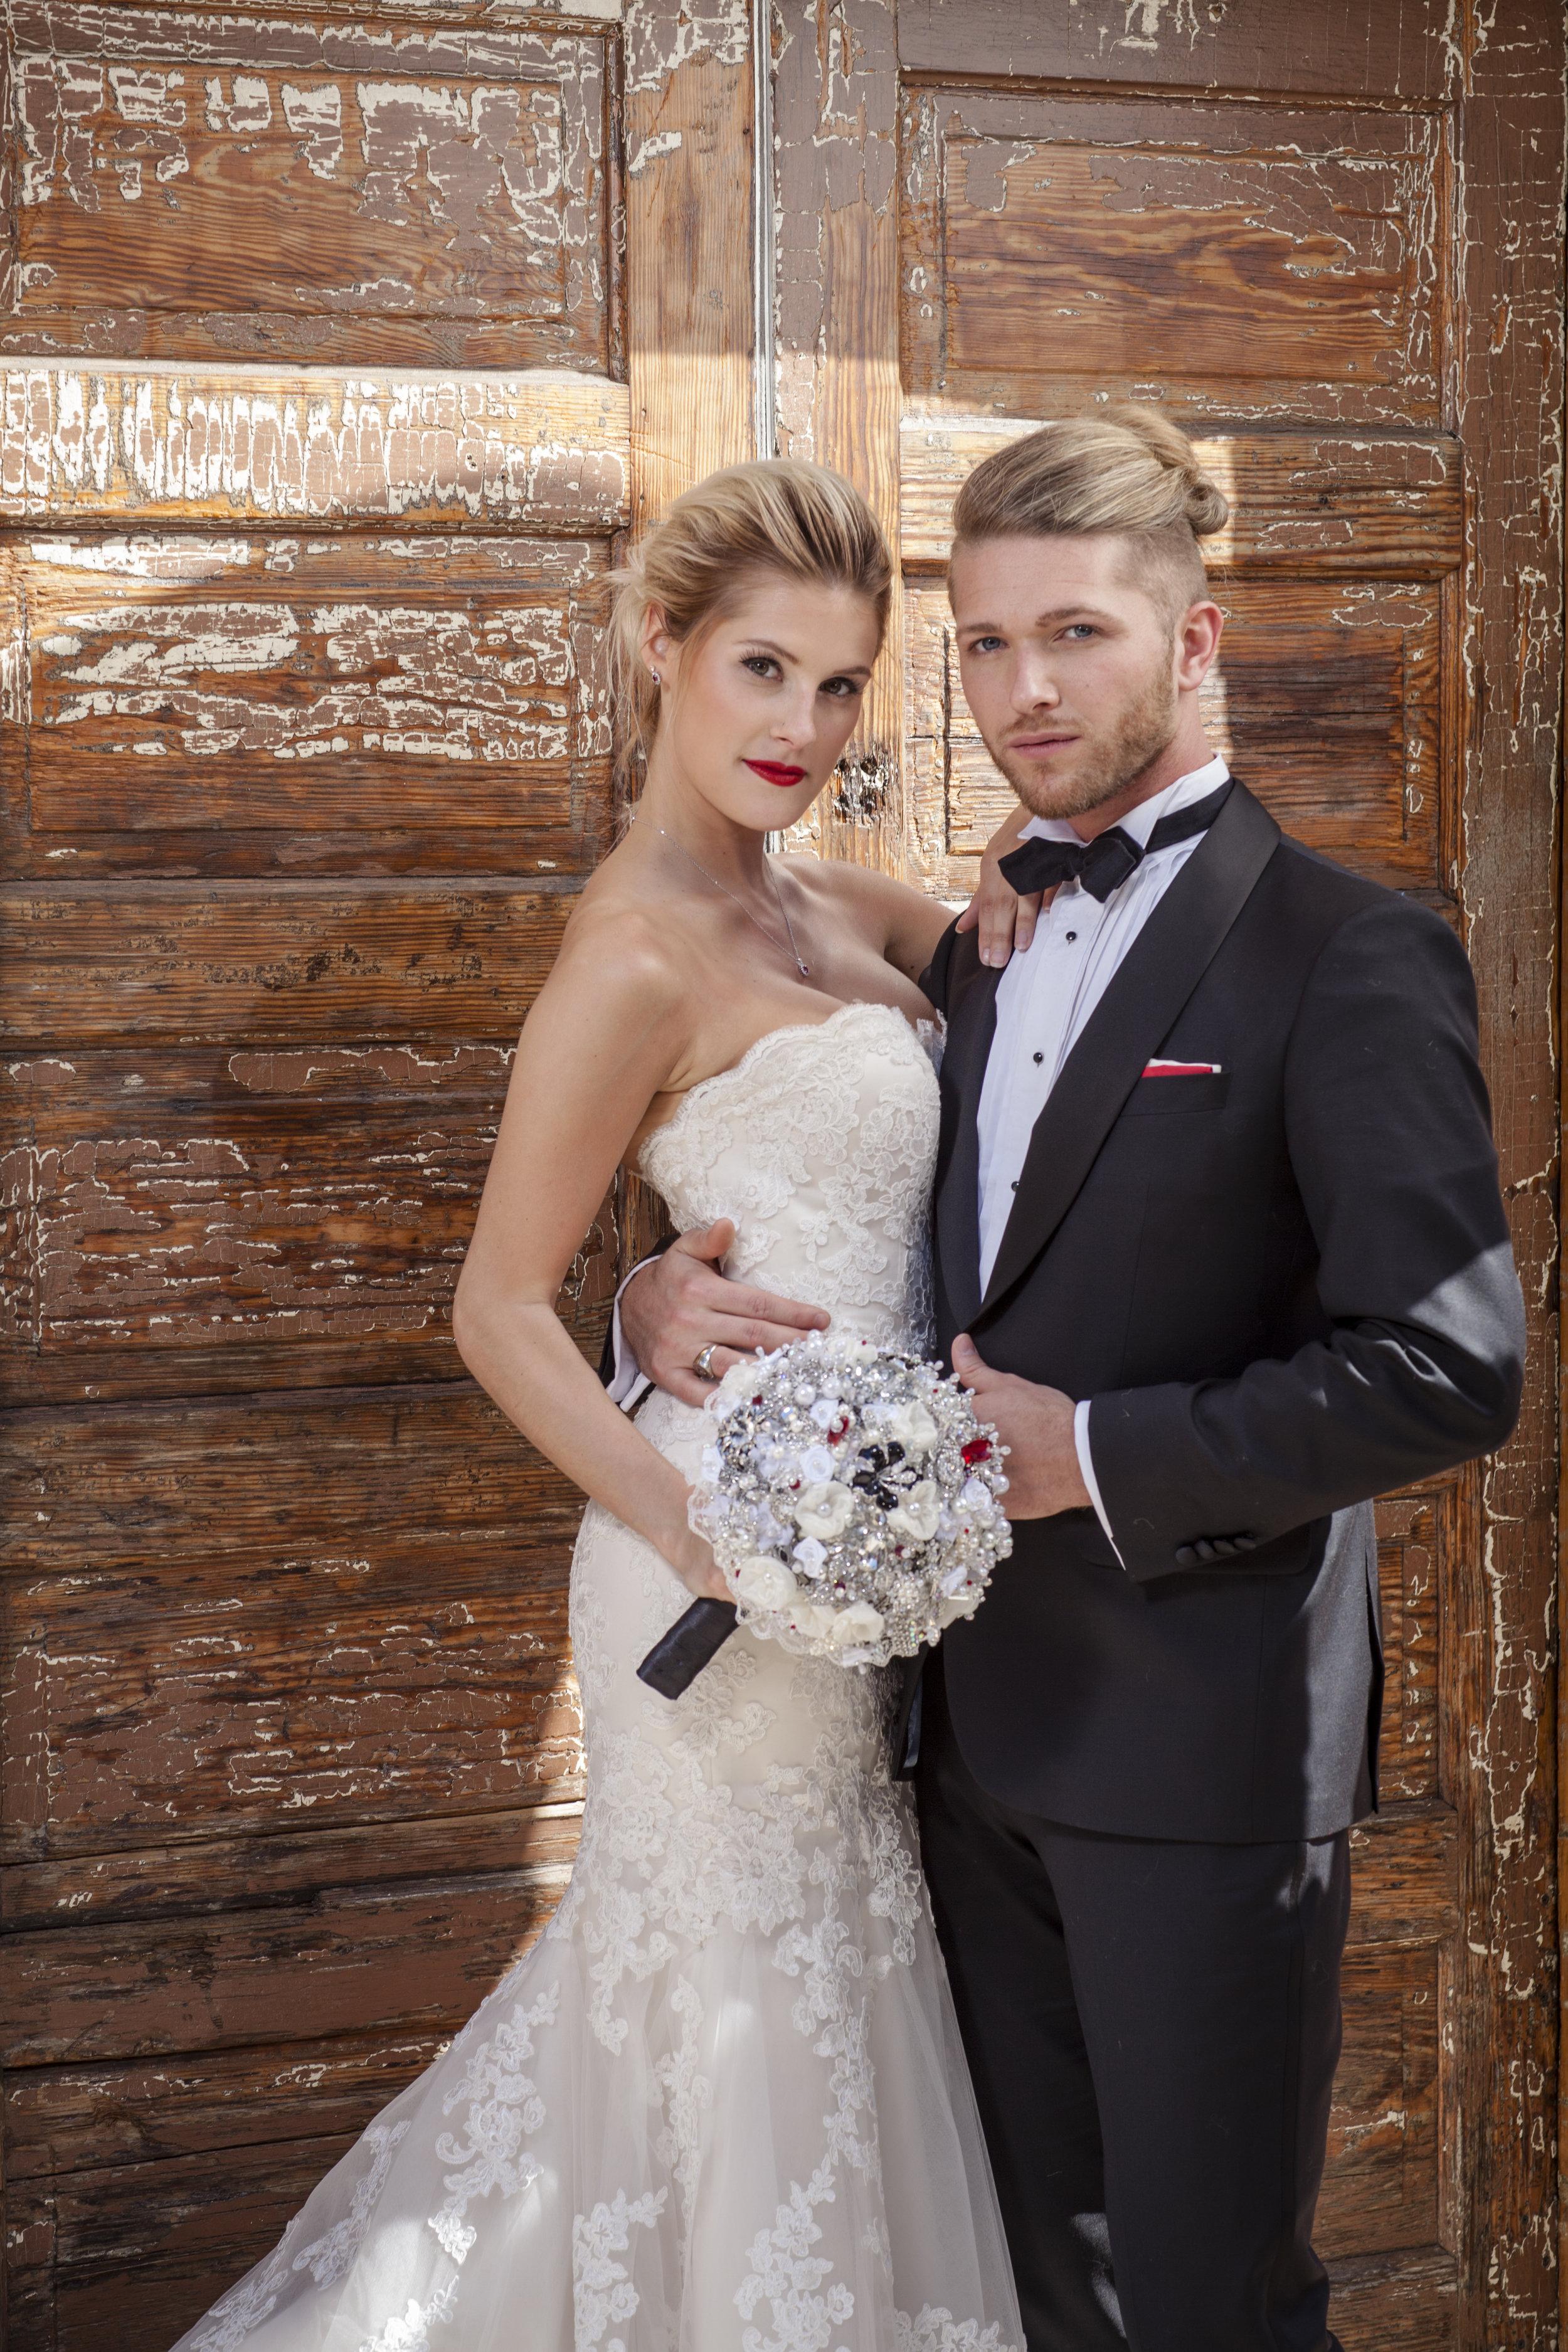 The Wedding planner magazine photo shoot